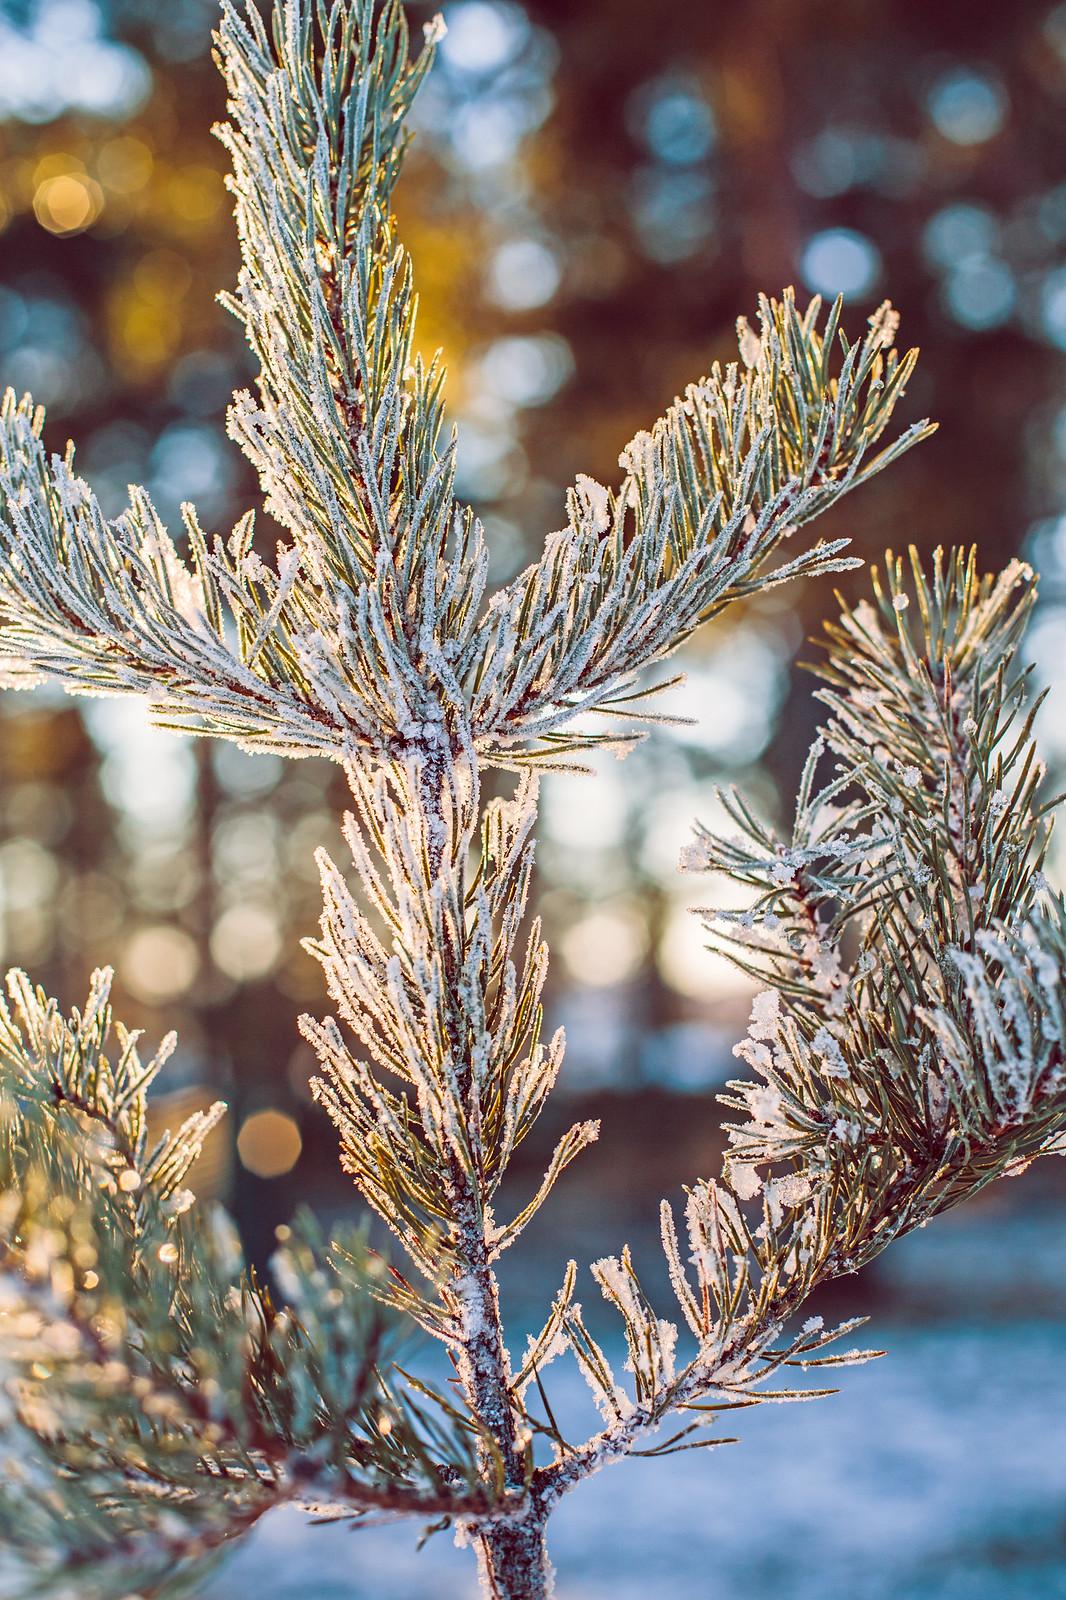 Frostig tall - Evelinas Ekologiska